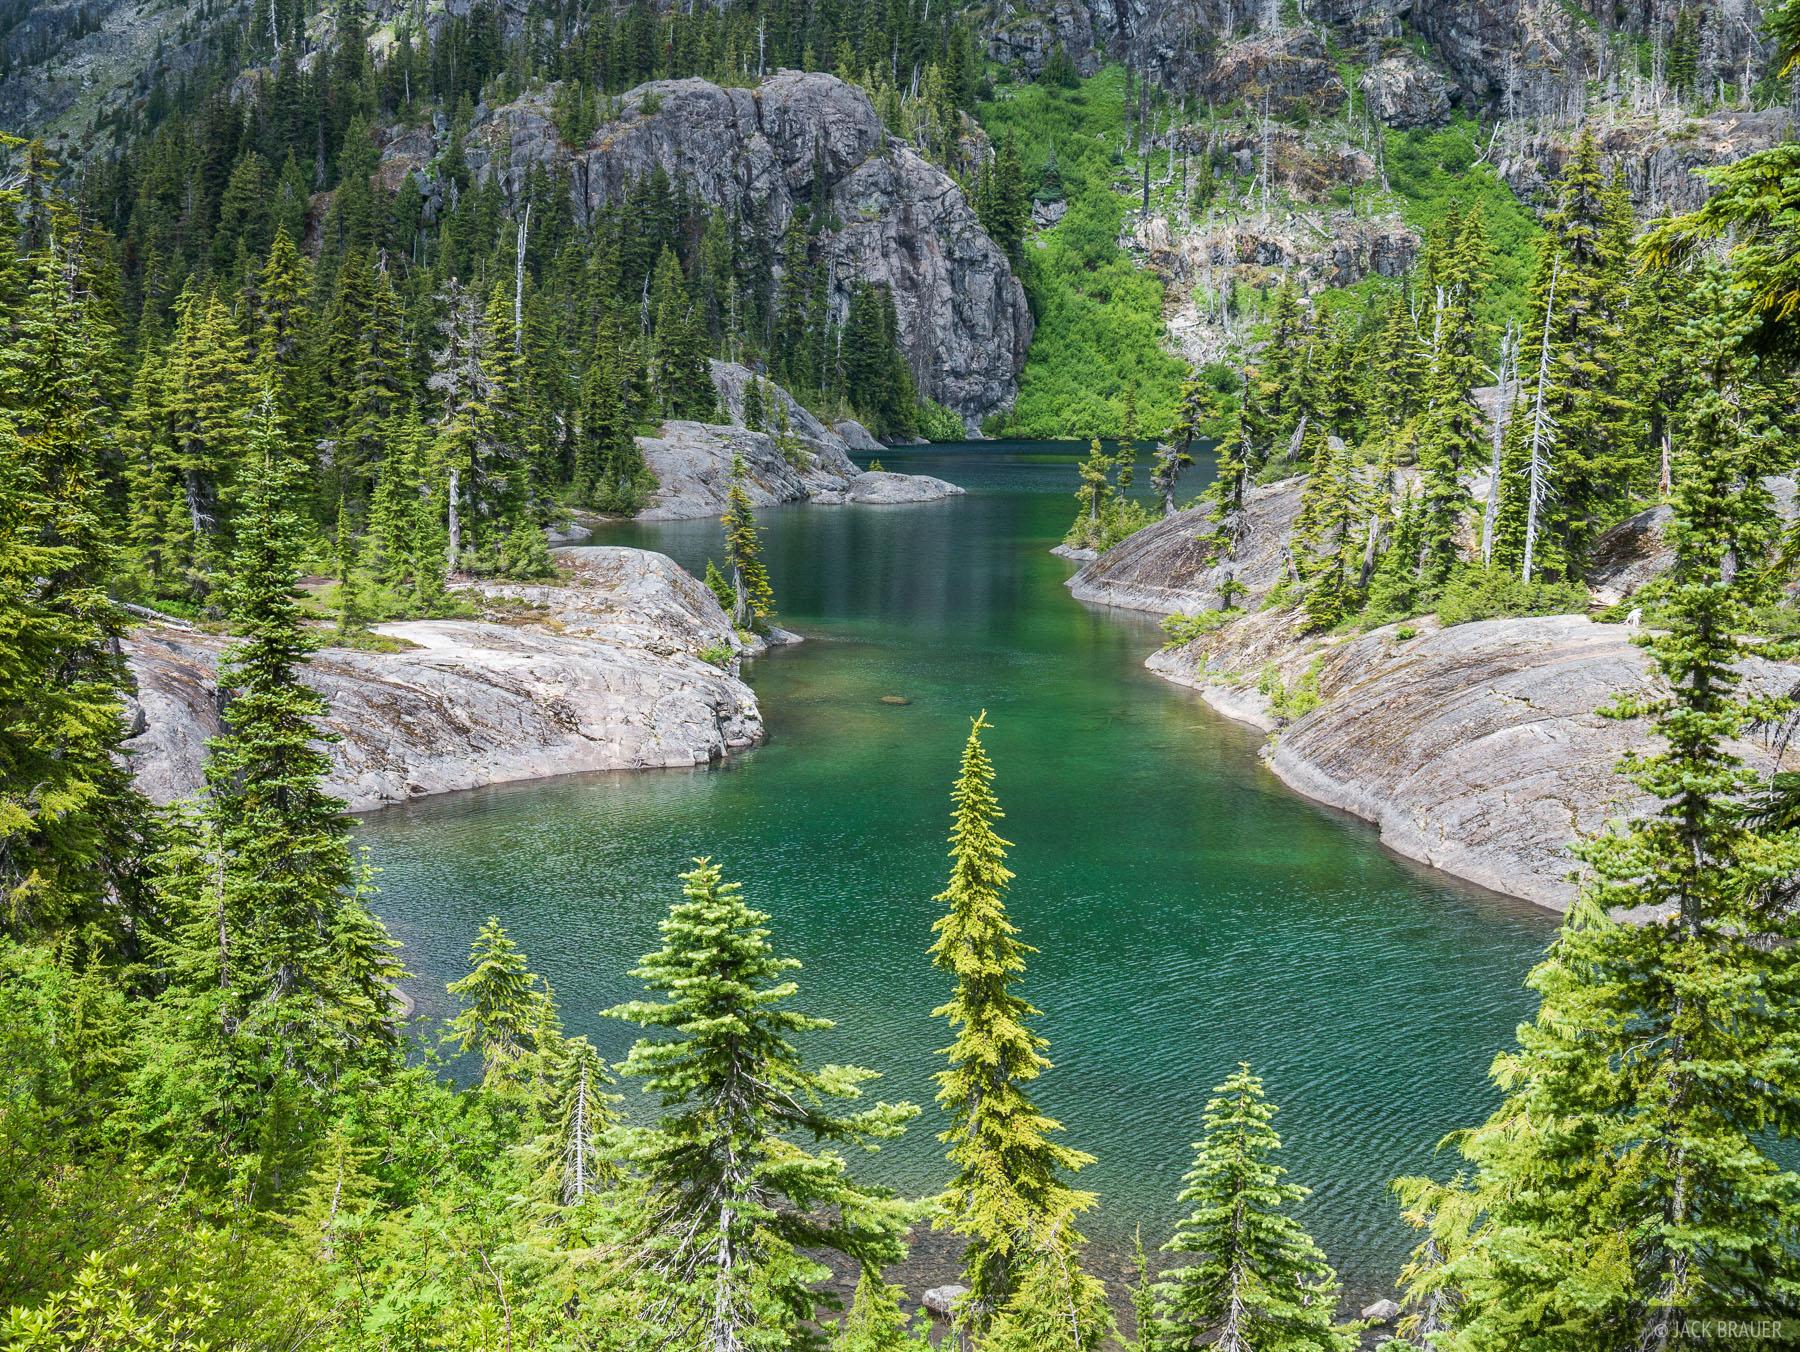 Alpine Lakes Wilderness, Spectacle Lake, Washington, Cascades, photo